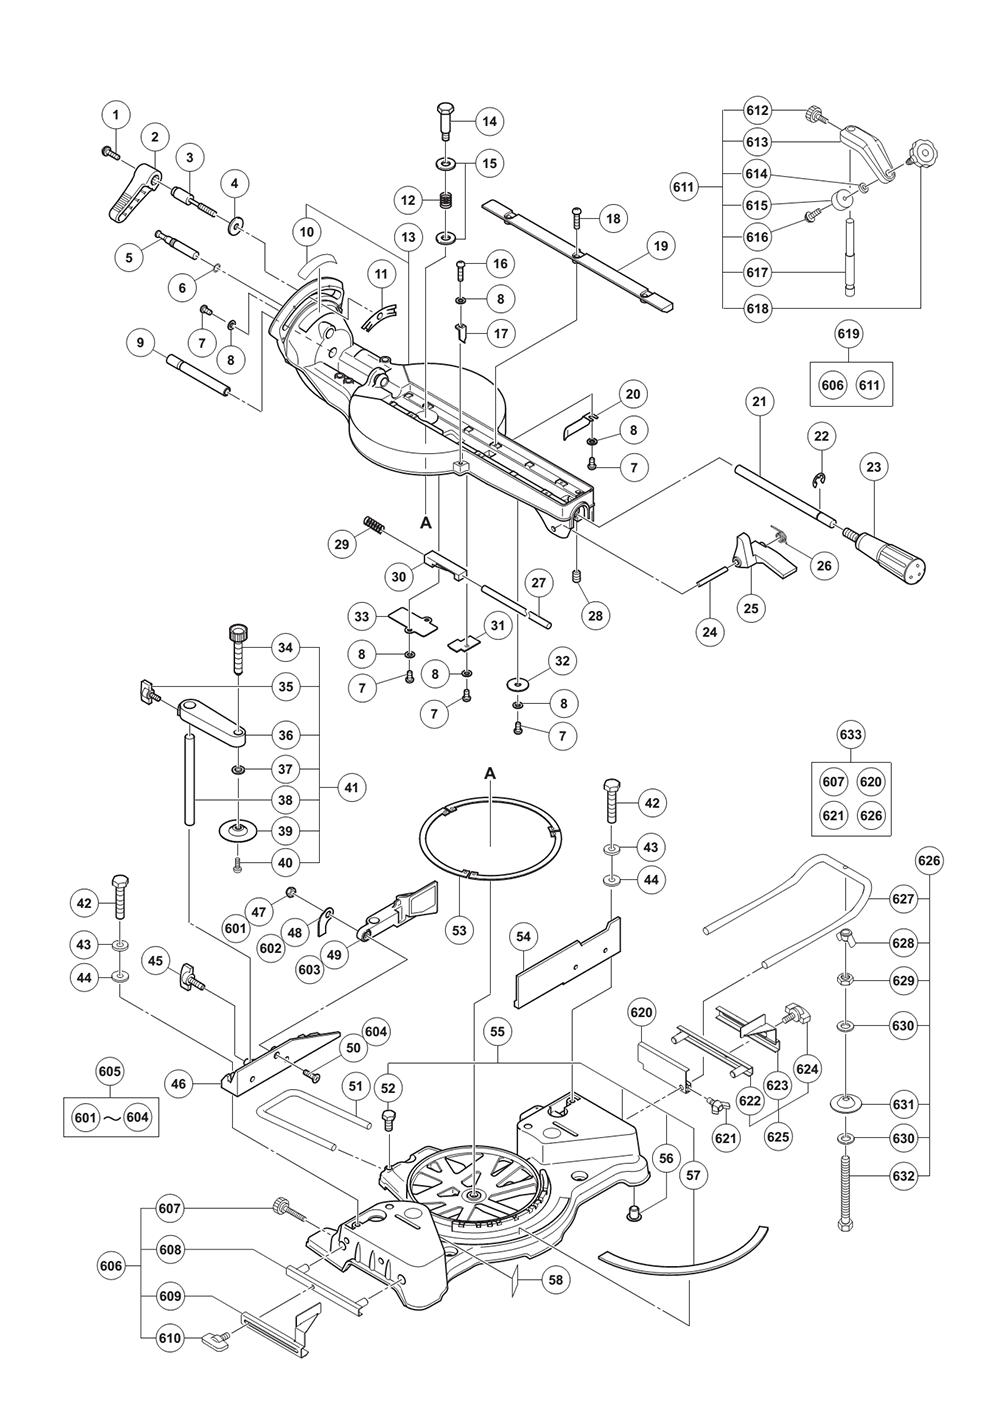 buy hitachi c8fse 8 1 2 inch sliding compound miter replacement hitachi c8fse parts schematic